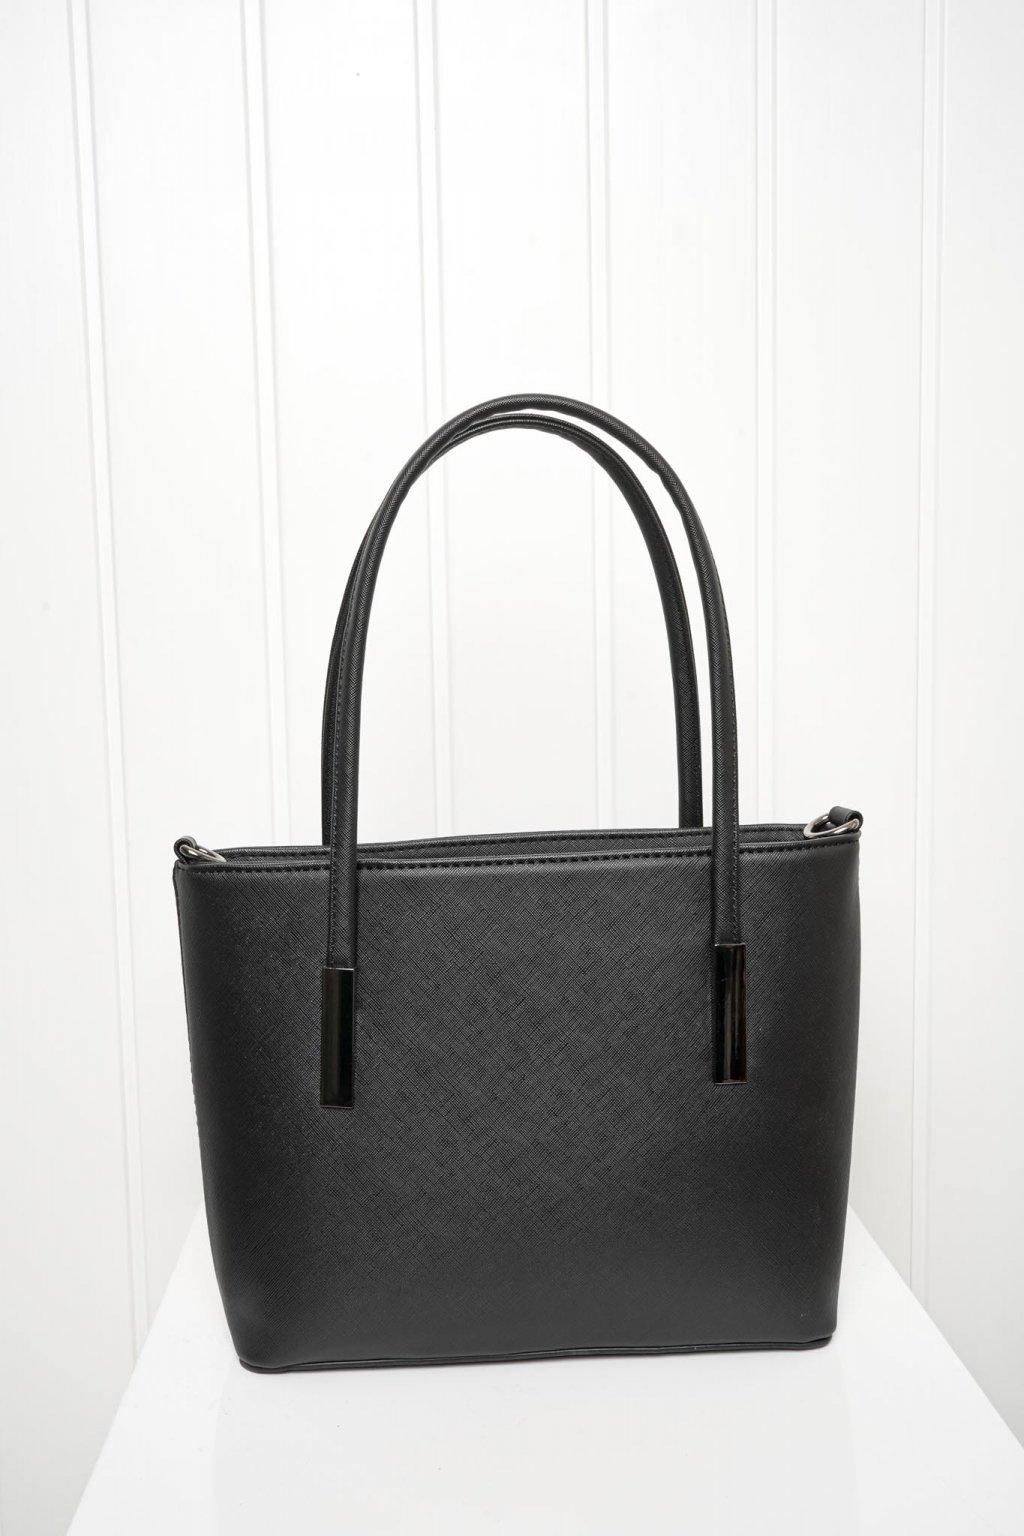 Kabelka, crossbody, ruksak, shopping bag, shopperka, 024